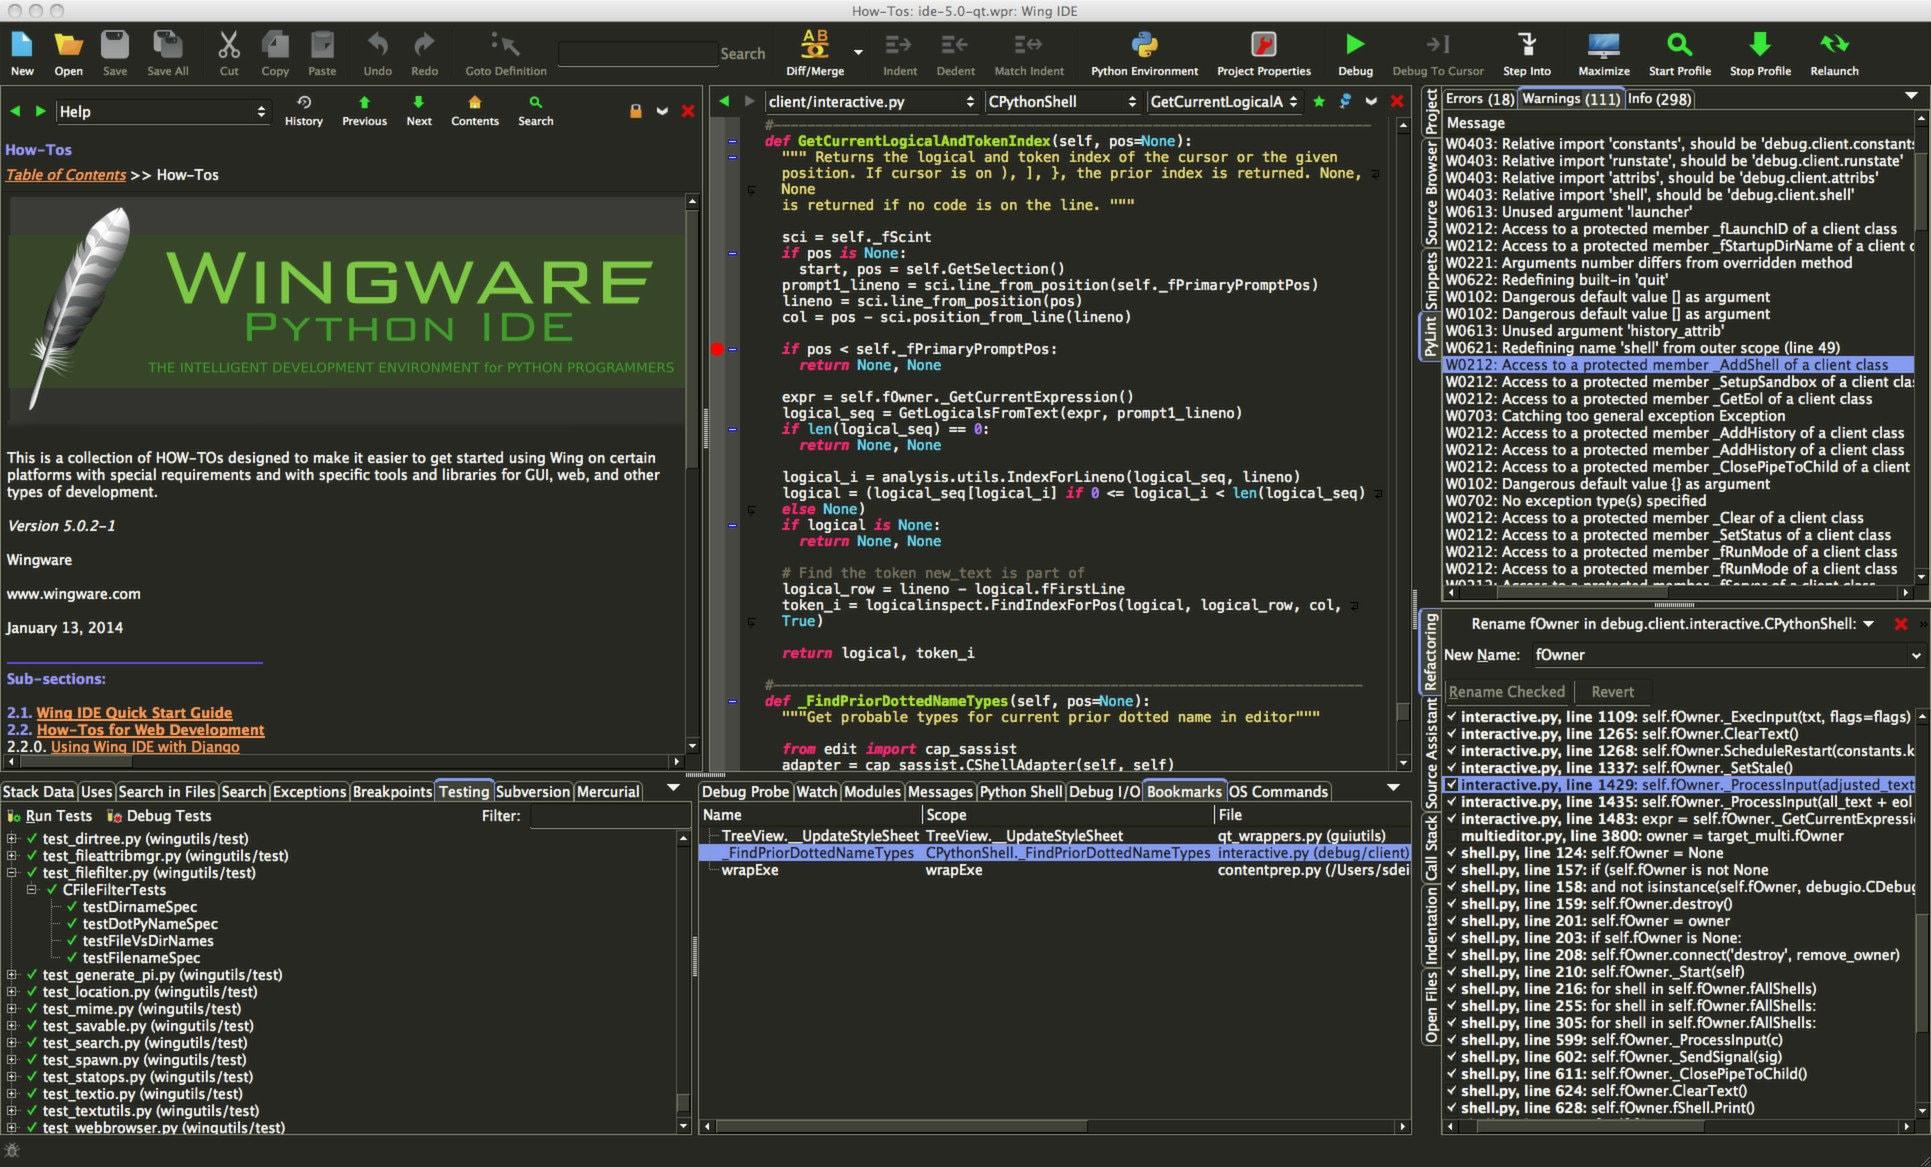 Probao sam (programirati): Wing IDE 5